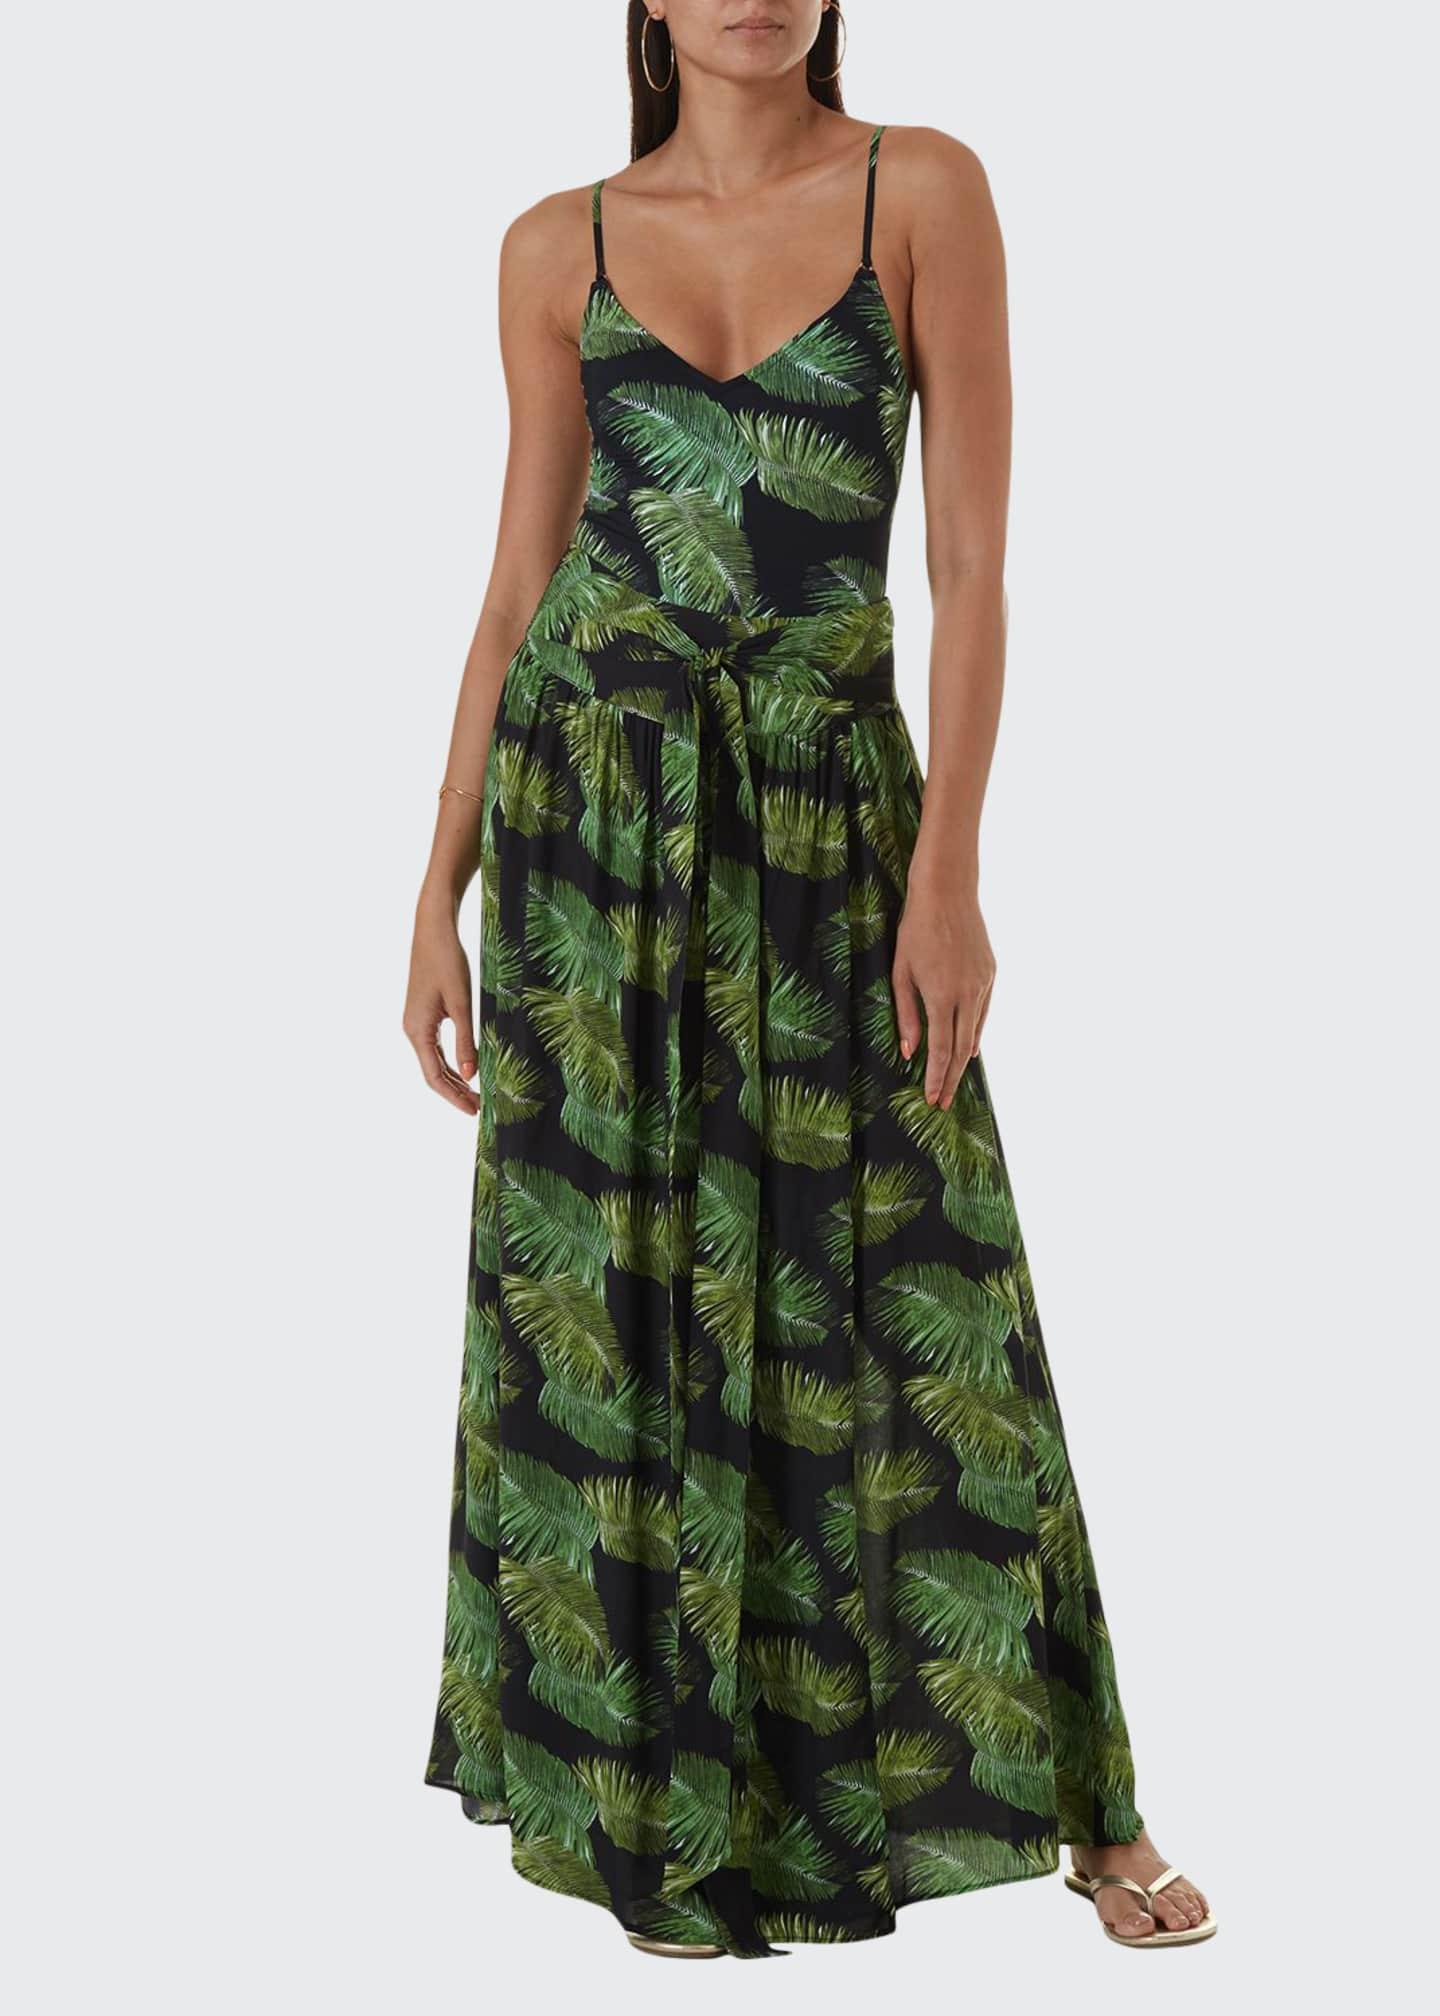 Melissa Odabash Palm-Leaf Print Tie-Waist Maxi Skirt